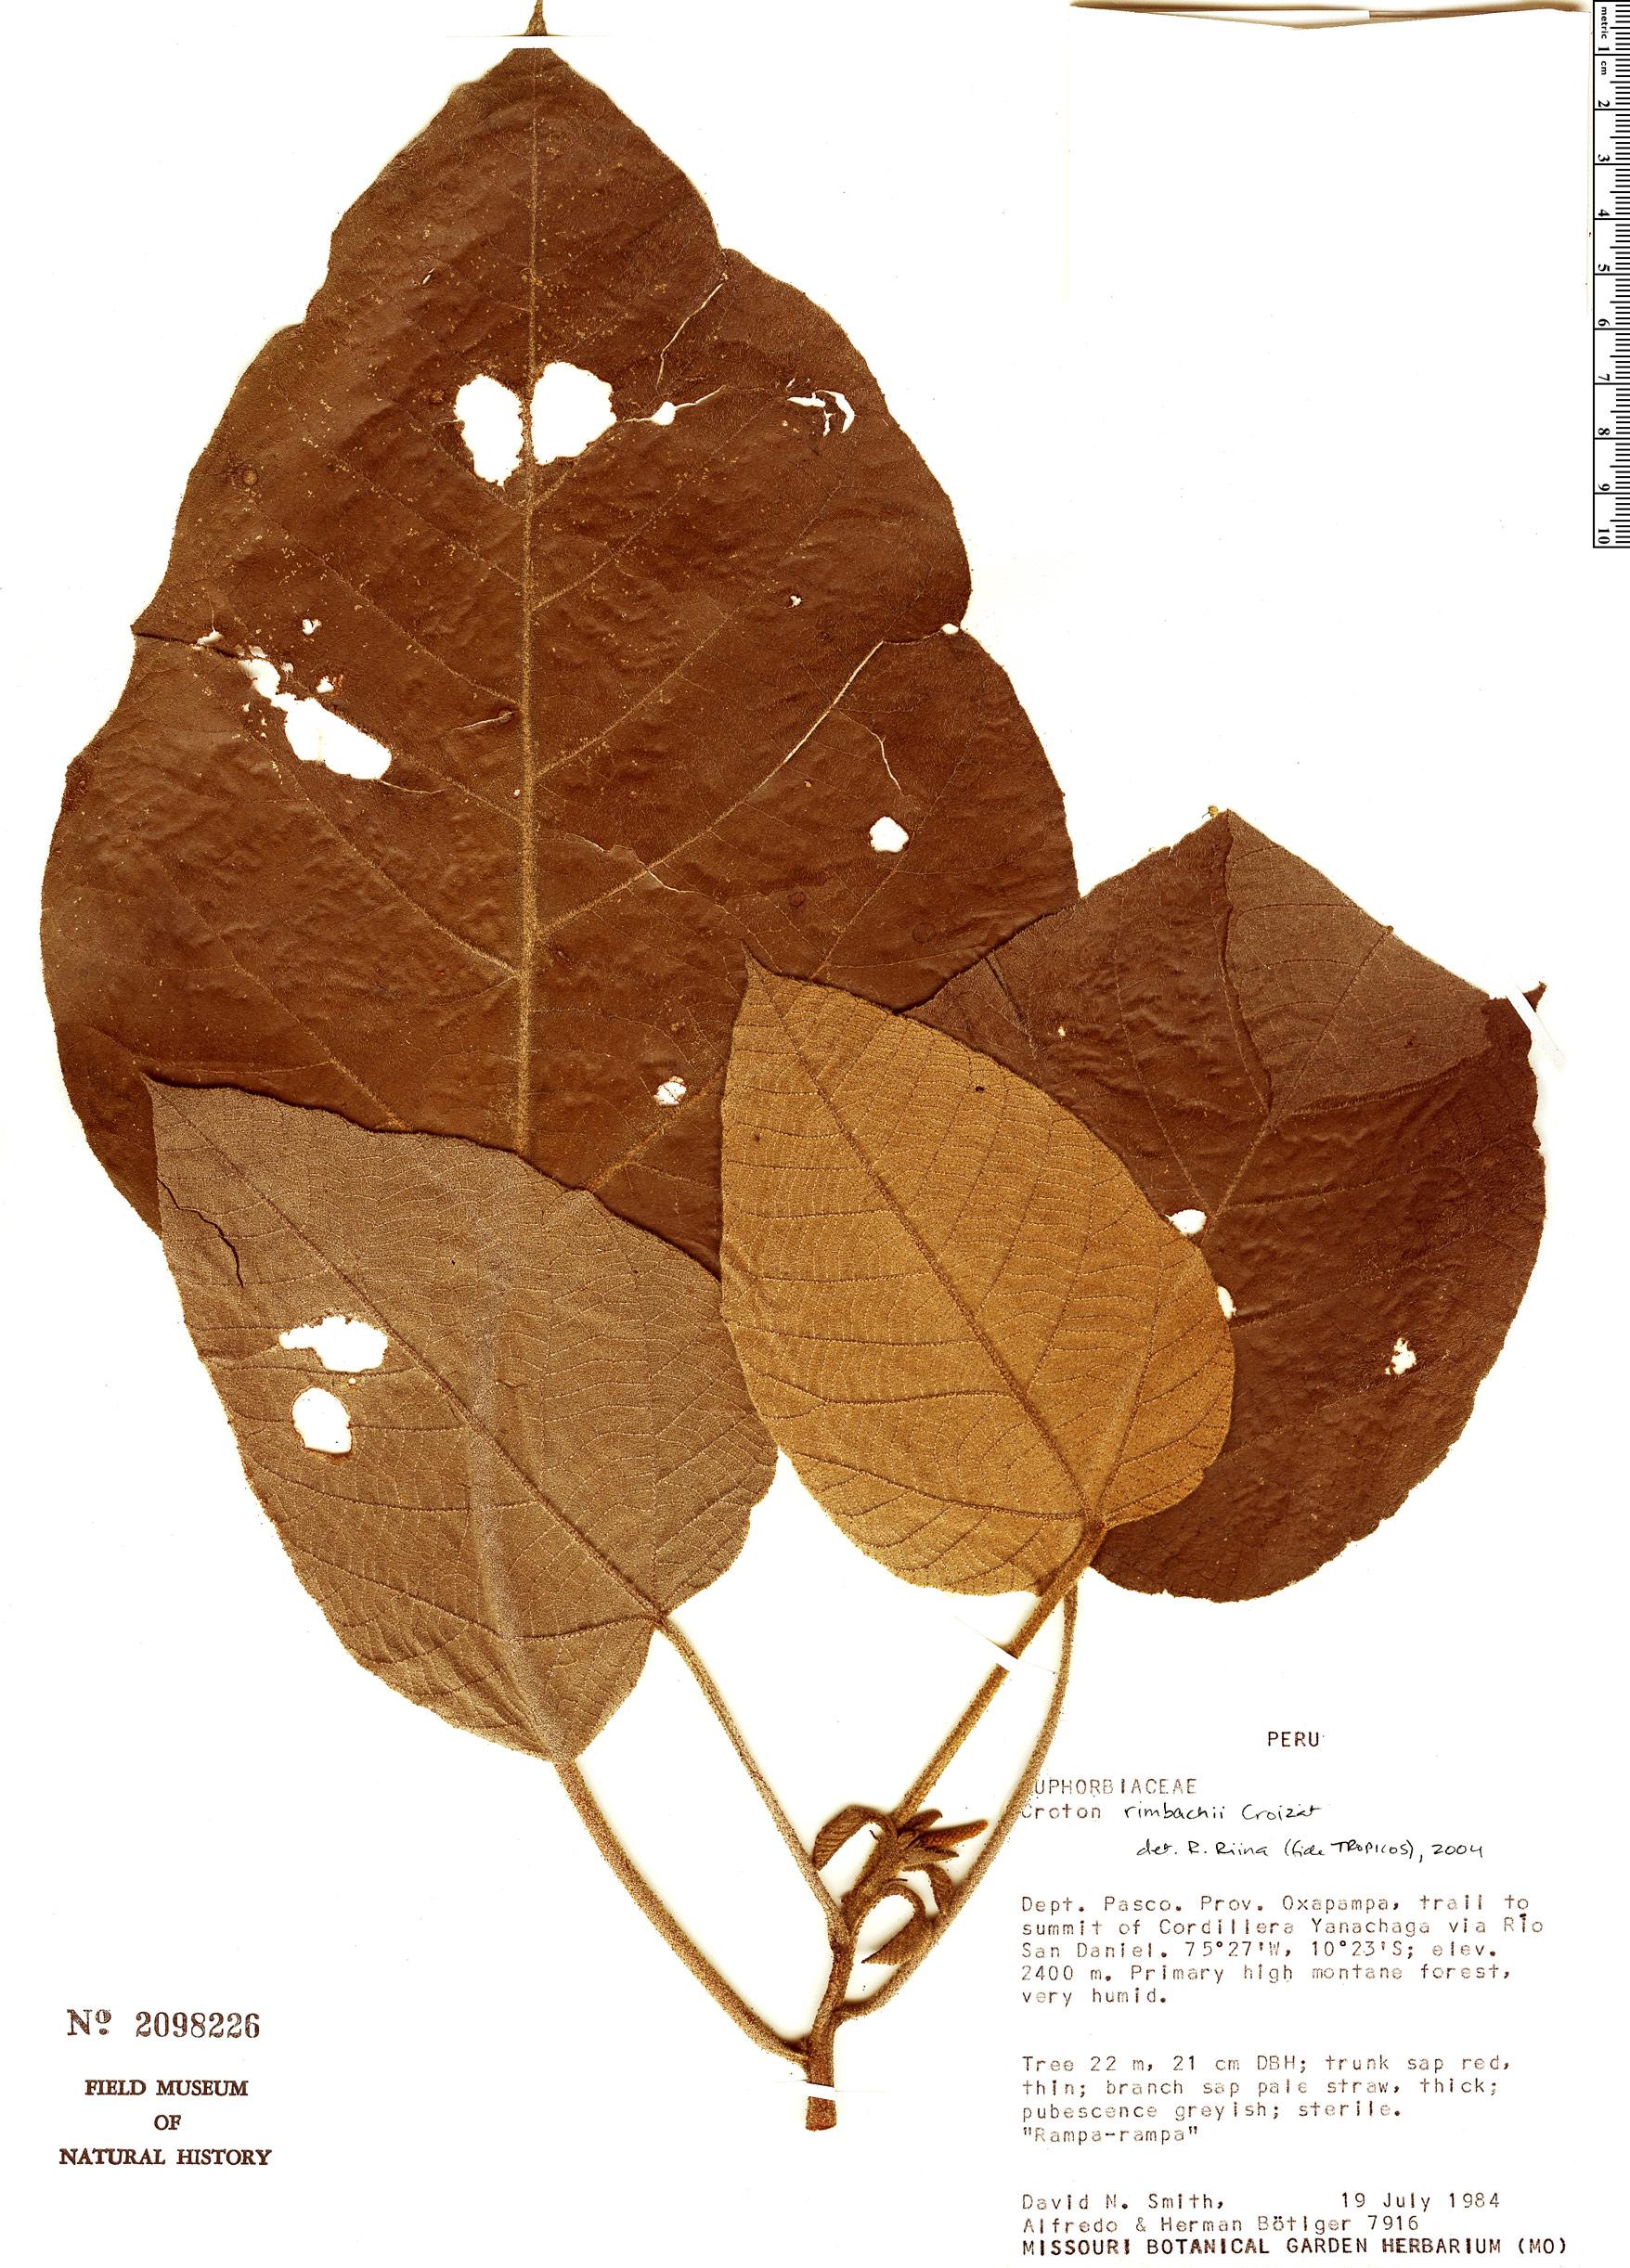 Specimen: Croton rimbachii